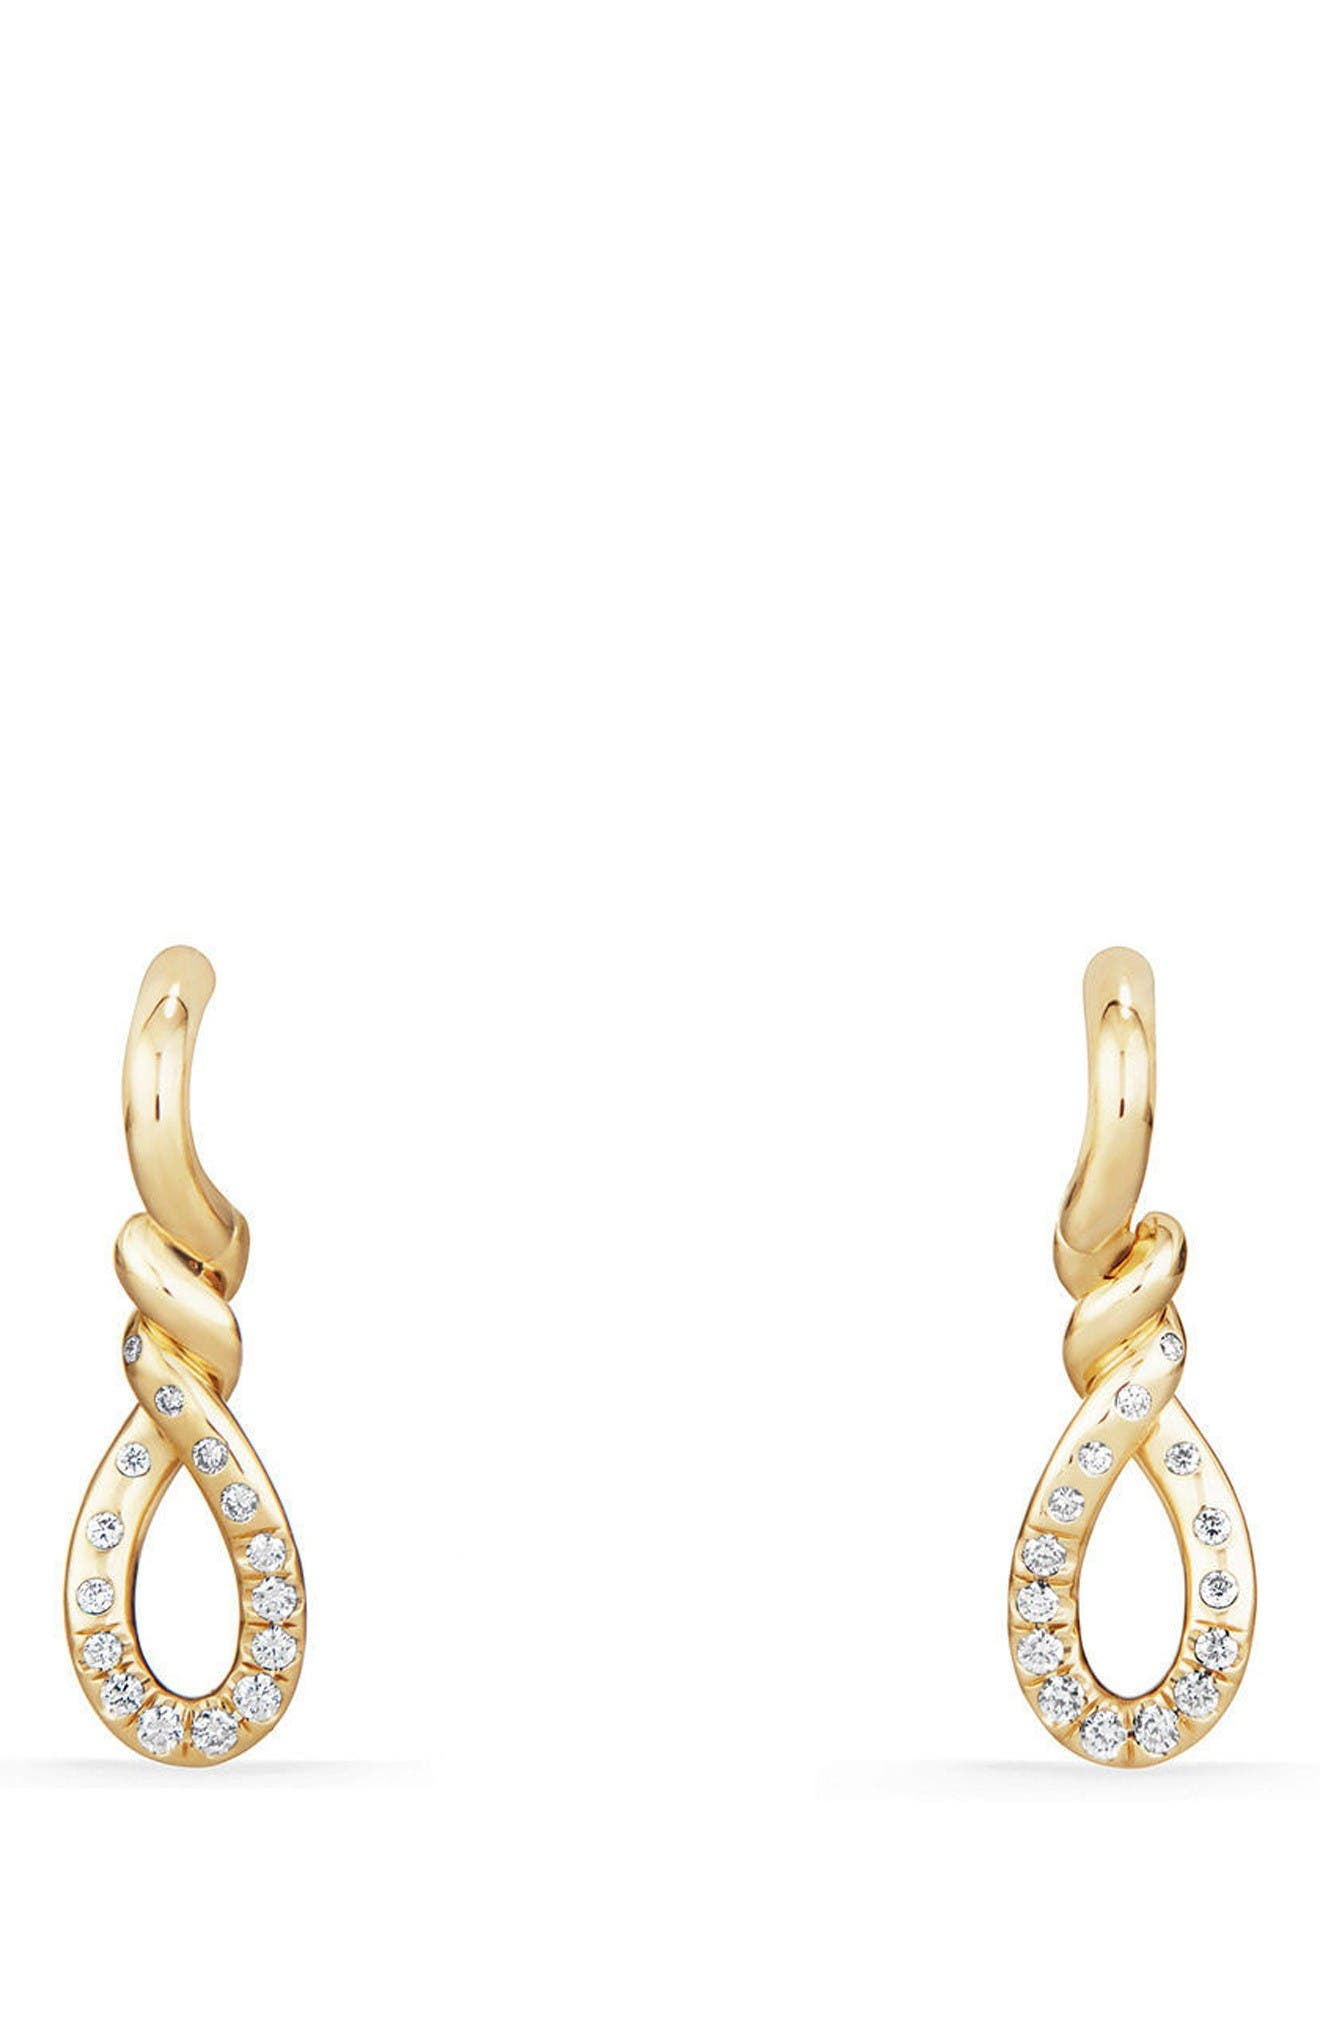 Main Image - David Yurman Continuance Drop Earrings in 18K Gold with Diamonds